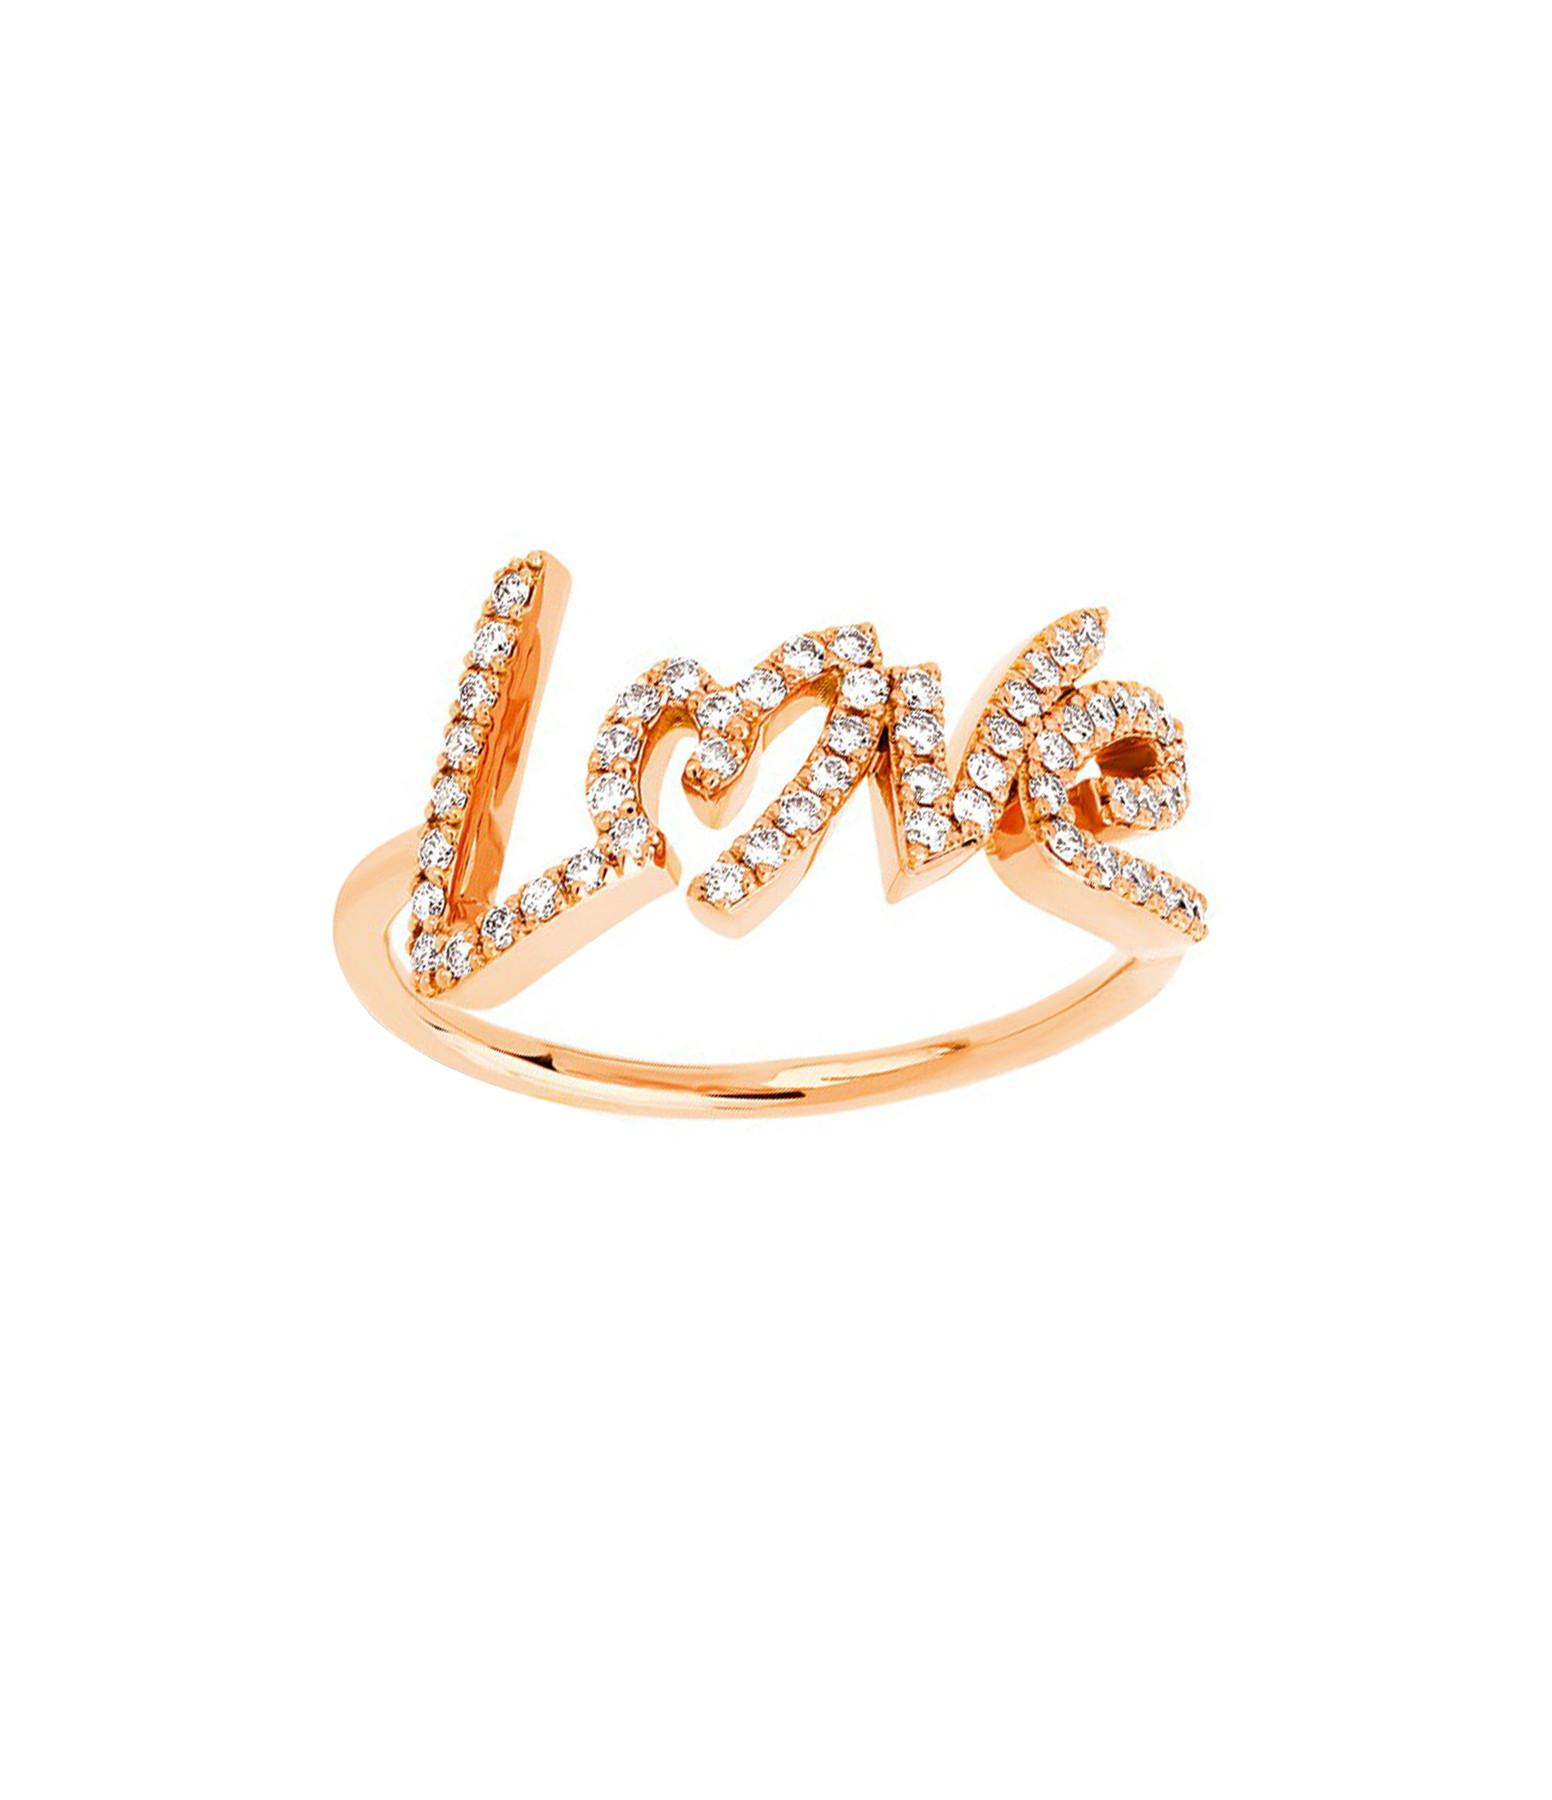 NAVA JOAILLERIE - Bague Love Diamants Or Rose